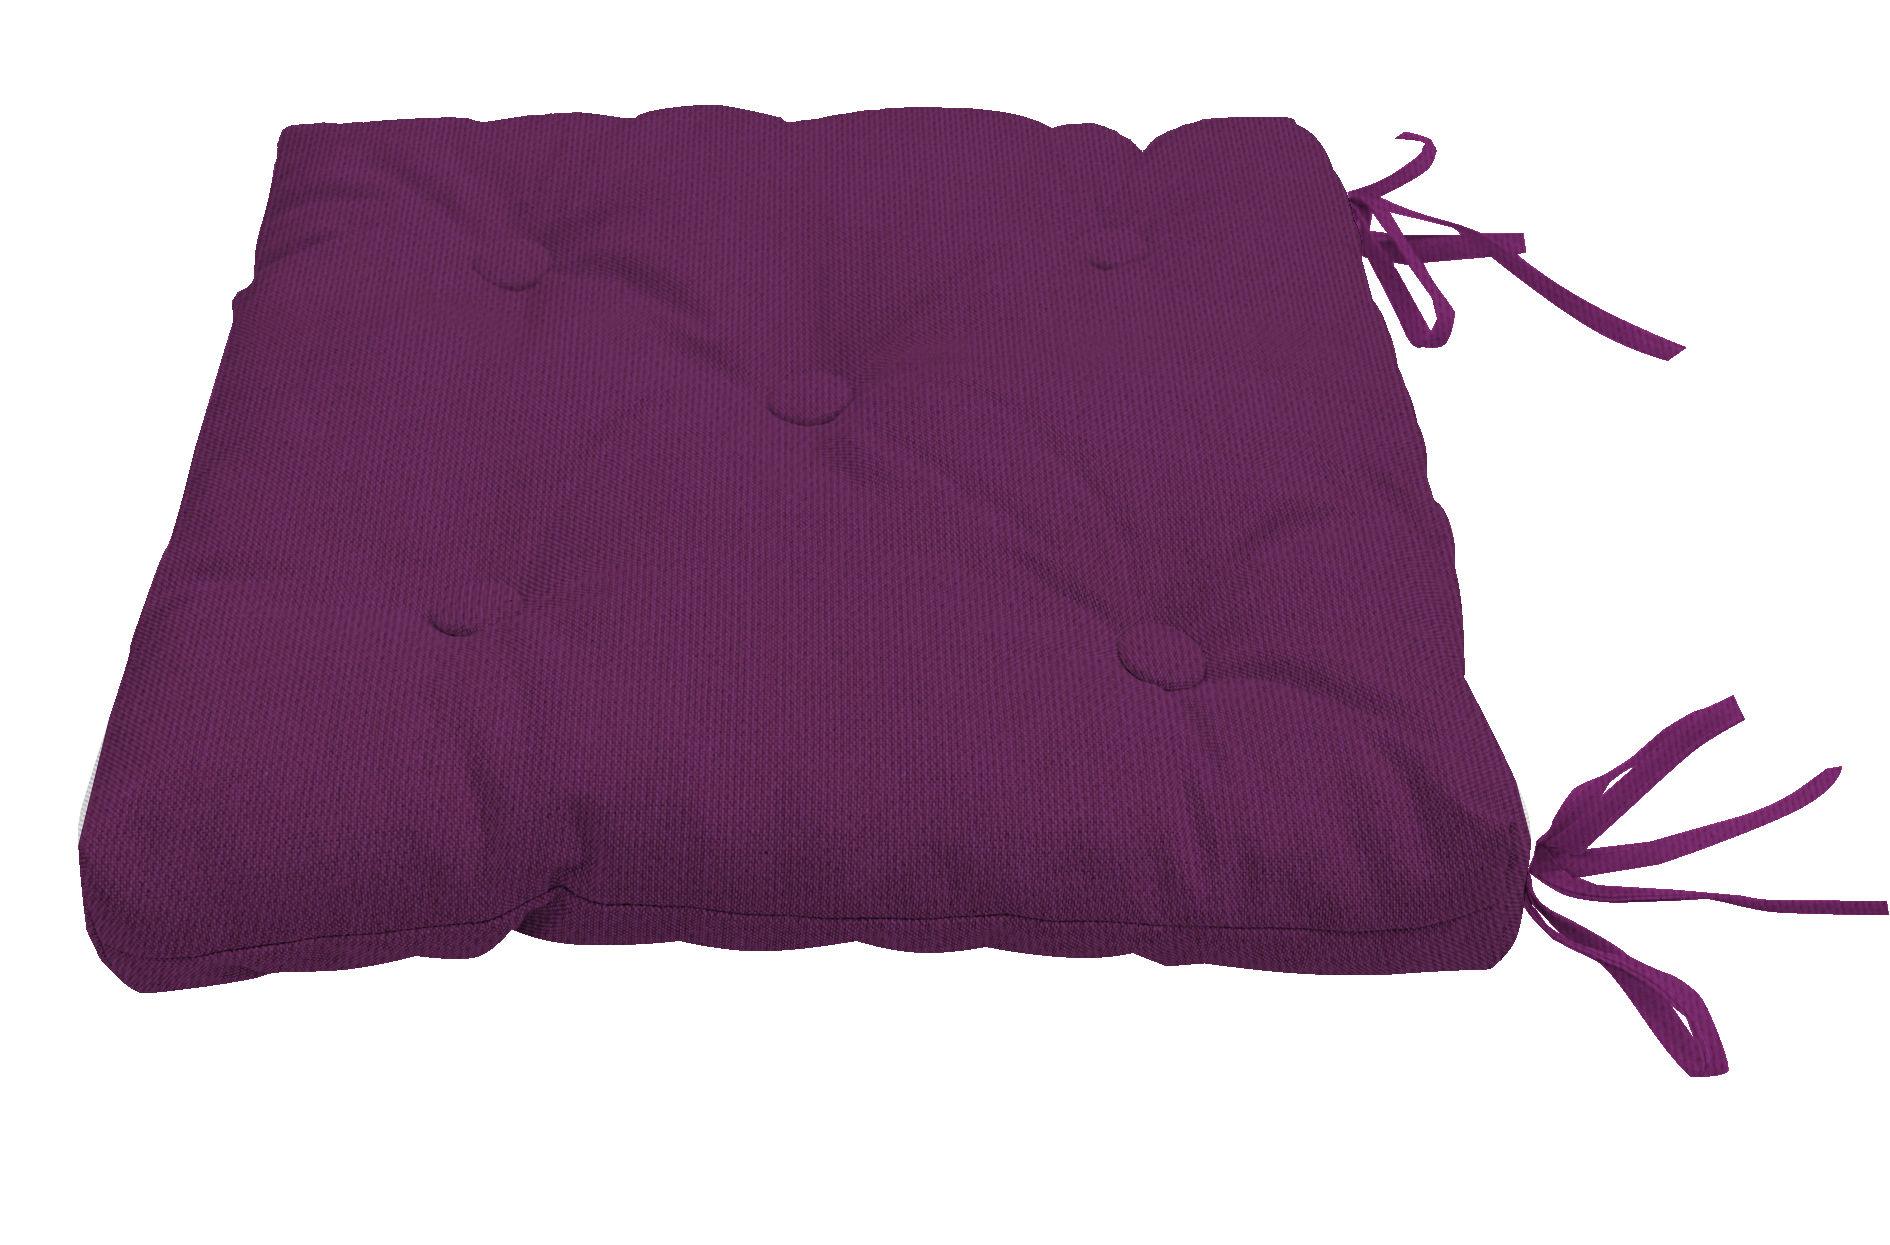 Декоративные подушки Kauffort Подушка на стул Нosta Цвет: Темно-Фиолетовый (40х40)